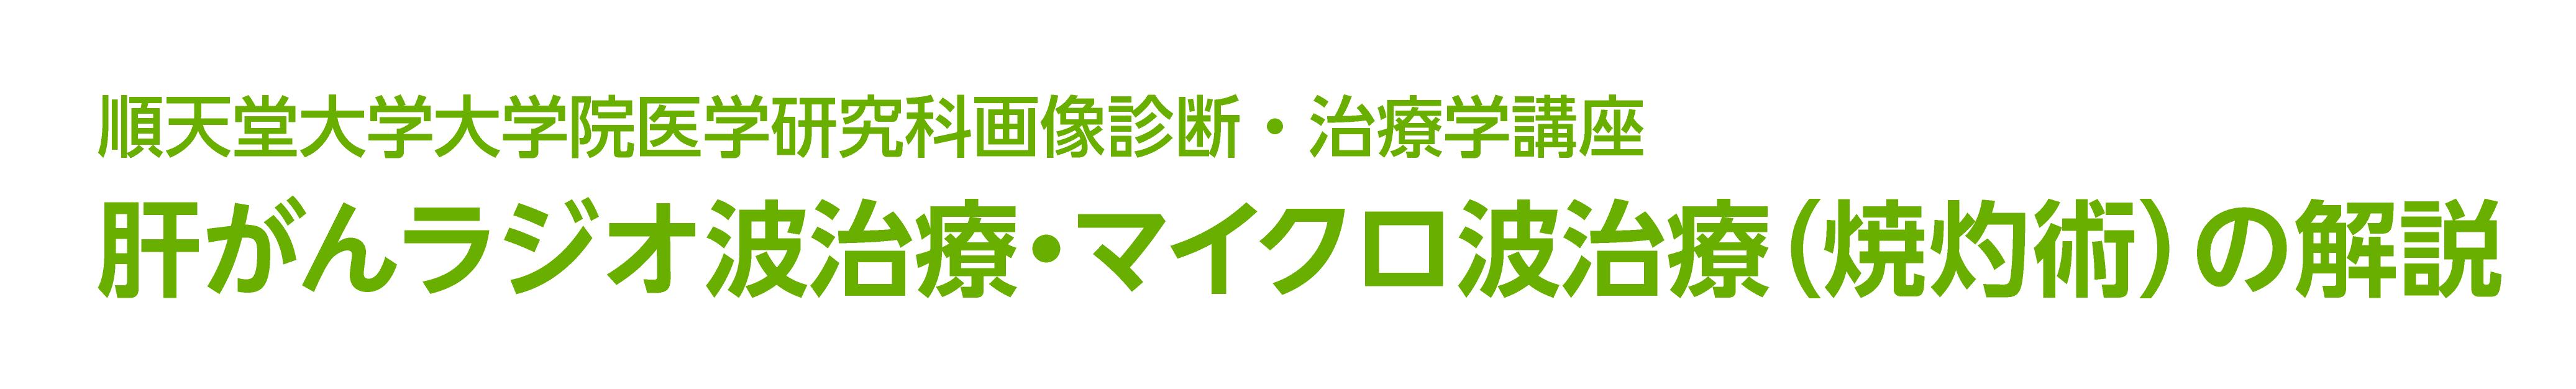 順天堂大学大学院医学研究科画像診断・治療学 肝臓がんラジオ波治療(焼灼術)の解説